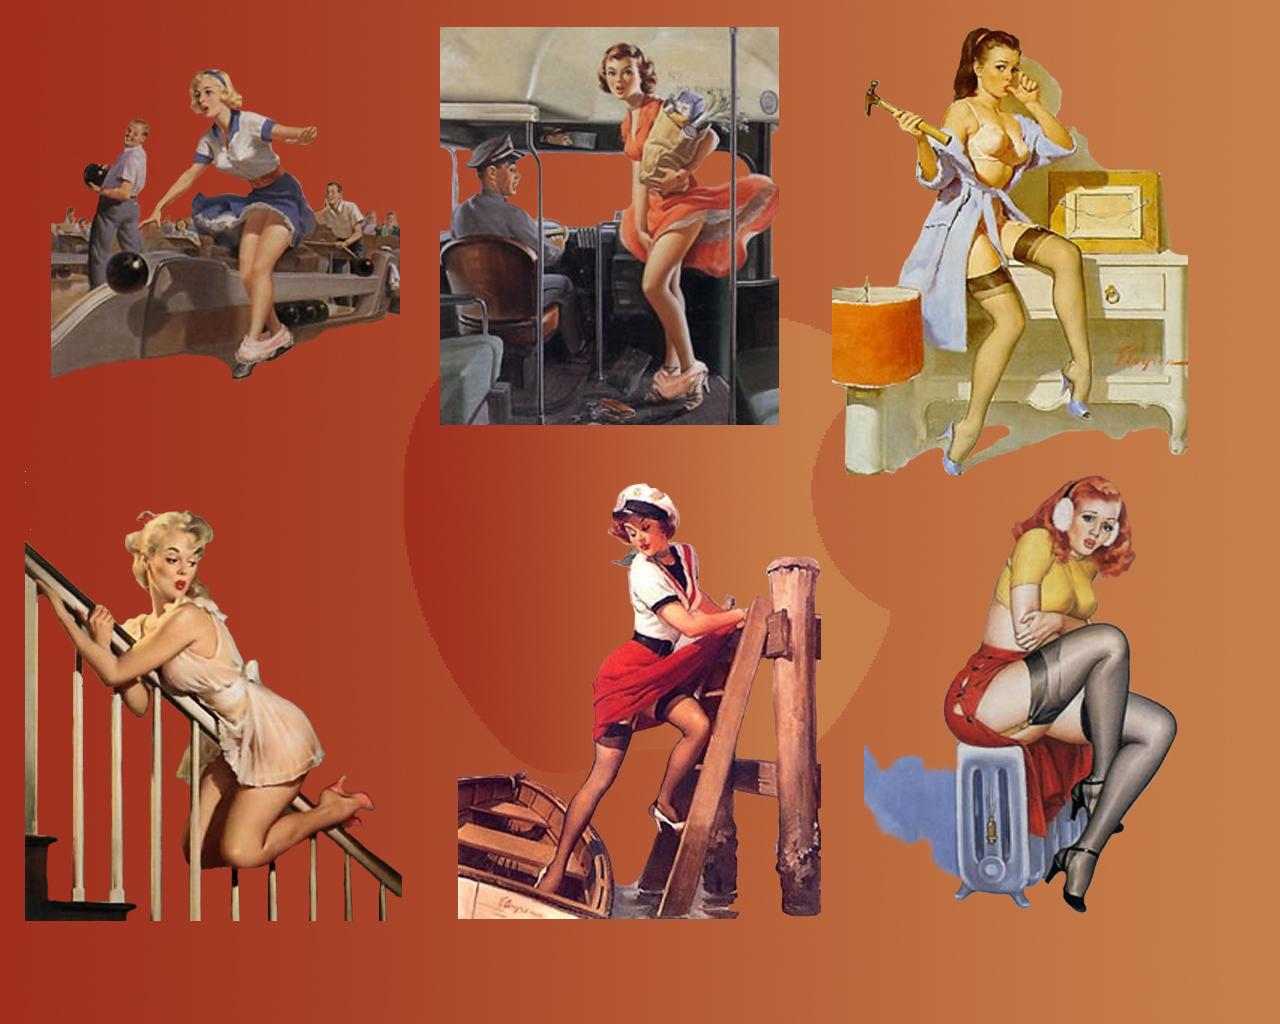 High Resolution Wallpaper: Pin-up Girls Wallpapers